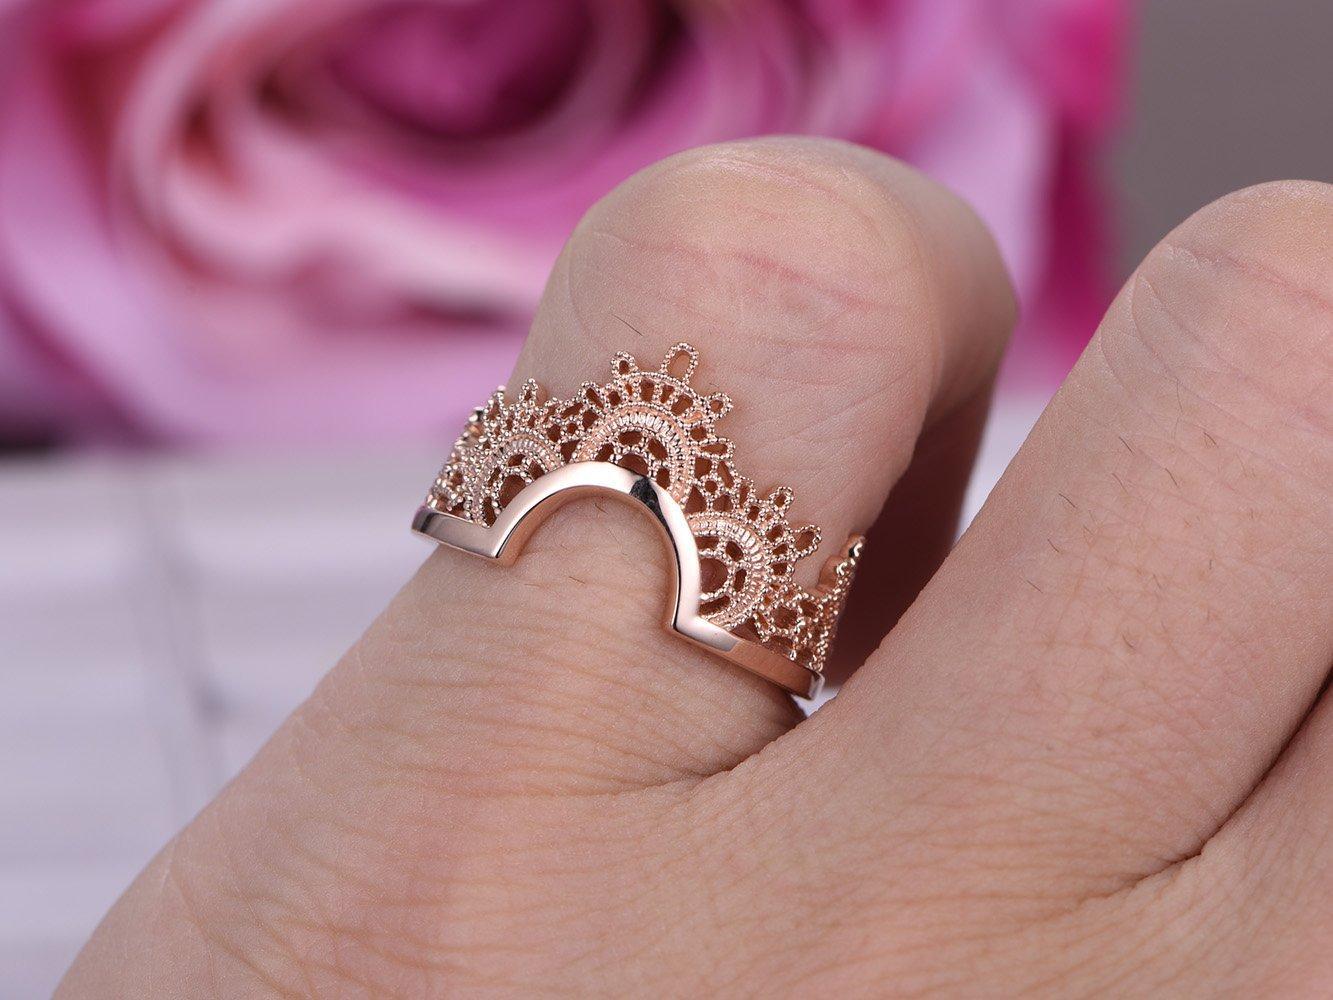 Amazon.com: Wedding Band Tiara Ring Guard 14K Rose Gold: Handmade